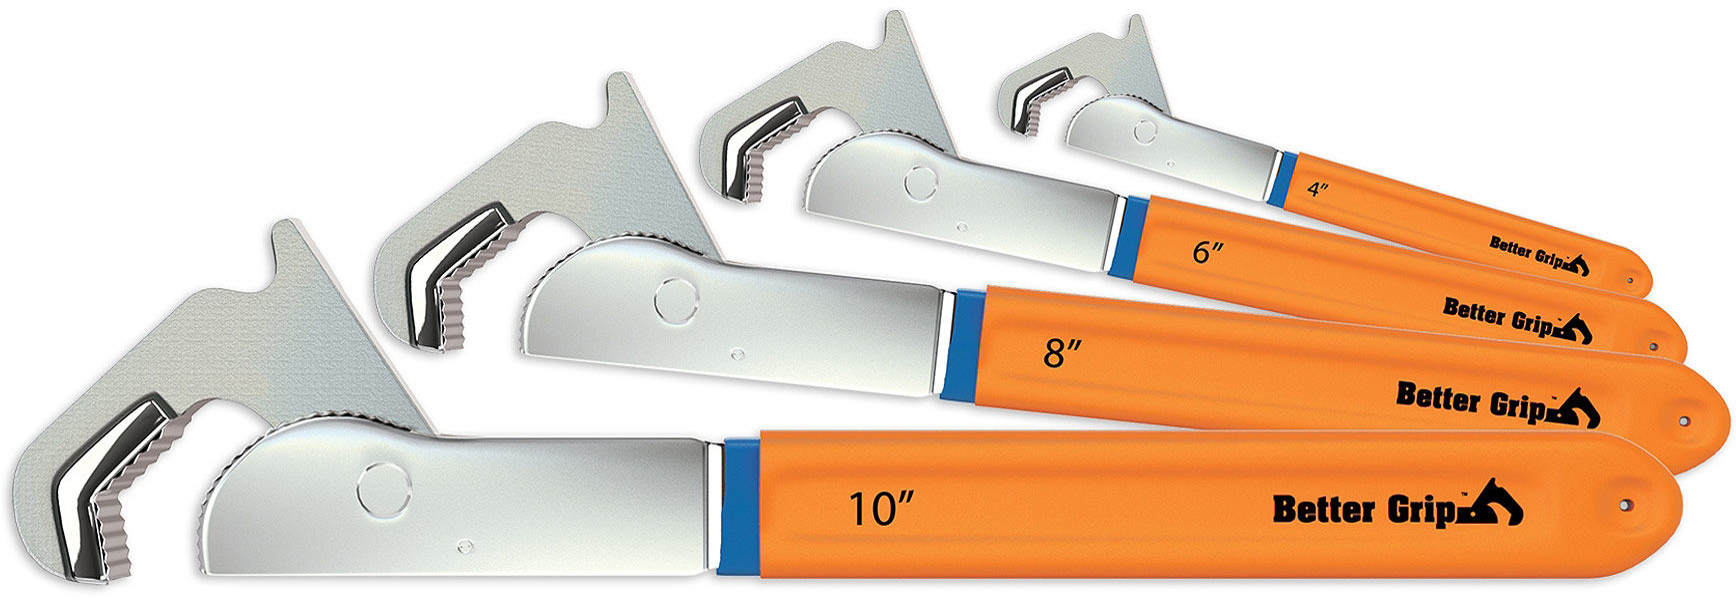 Zestaw kluczy uniwersalnych Better Grip